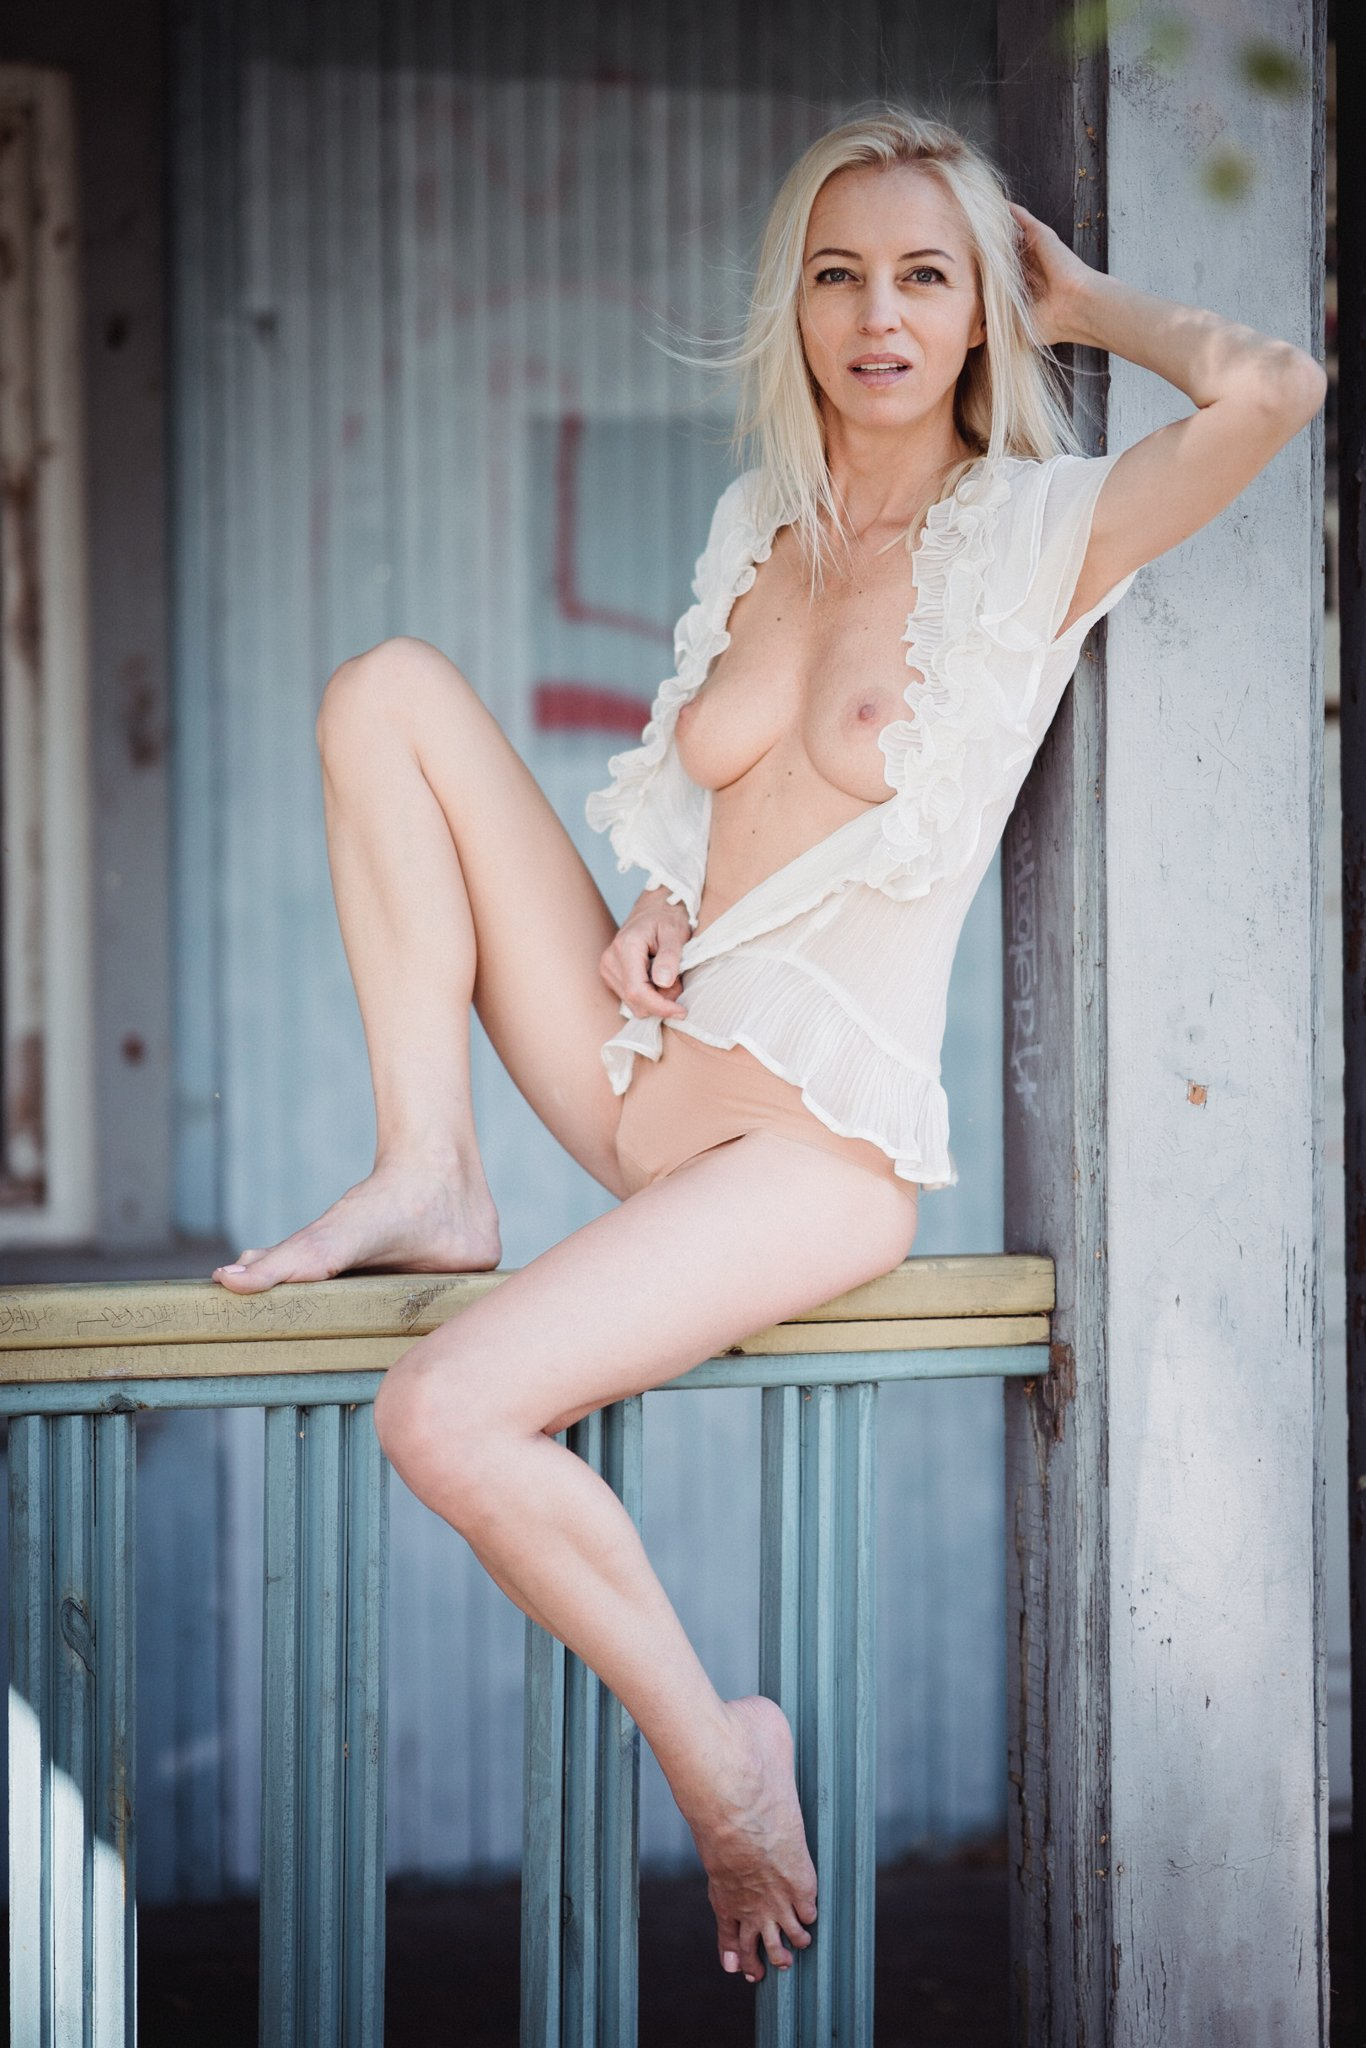 natural women blond fit body, Daniel Bidiuk